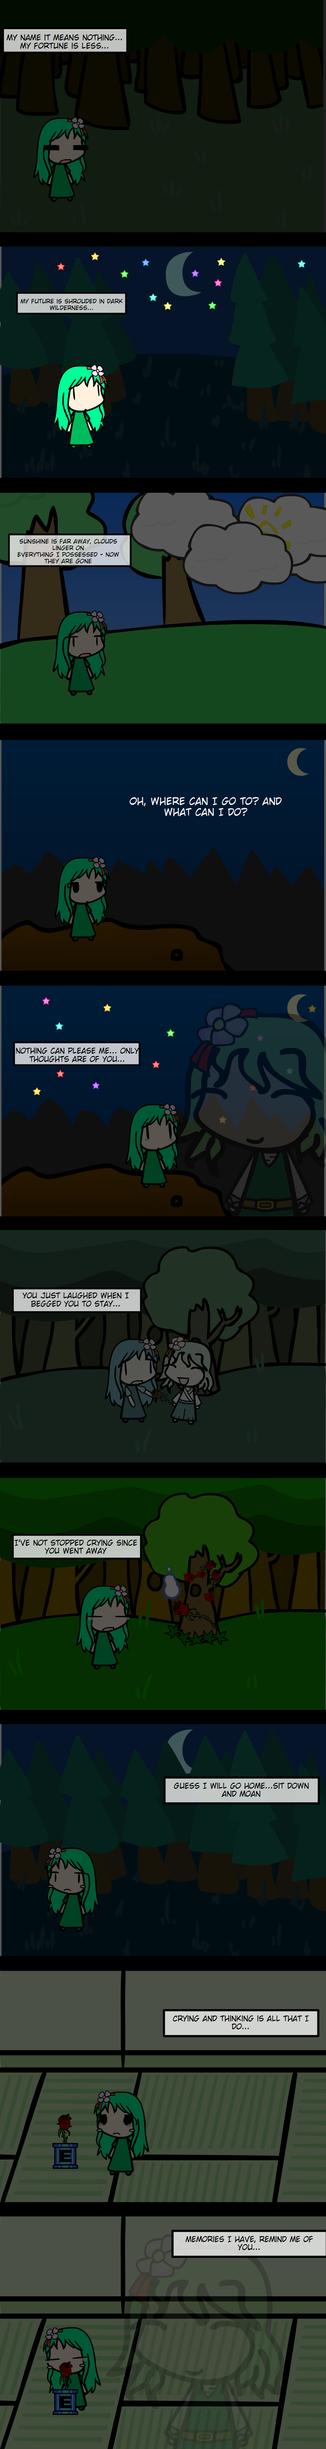 Solitude by YureiMari